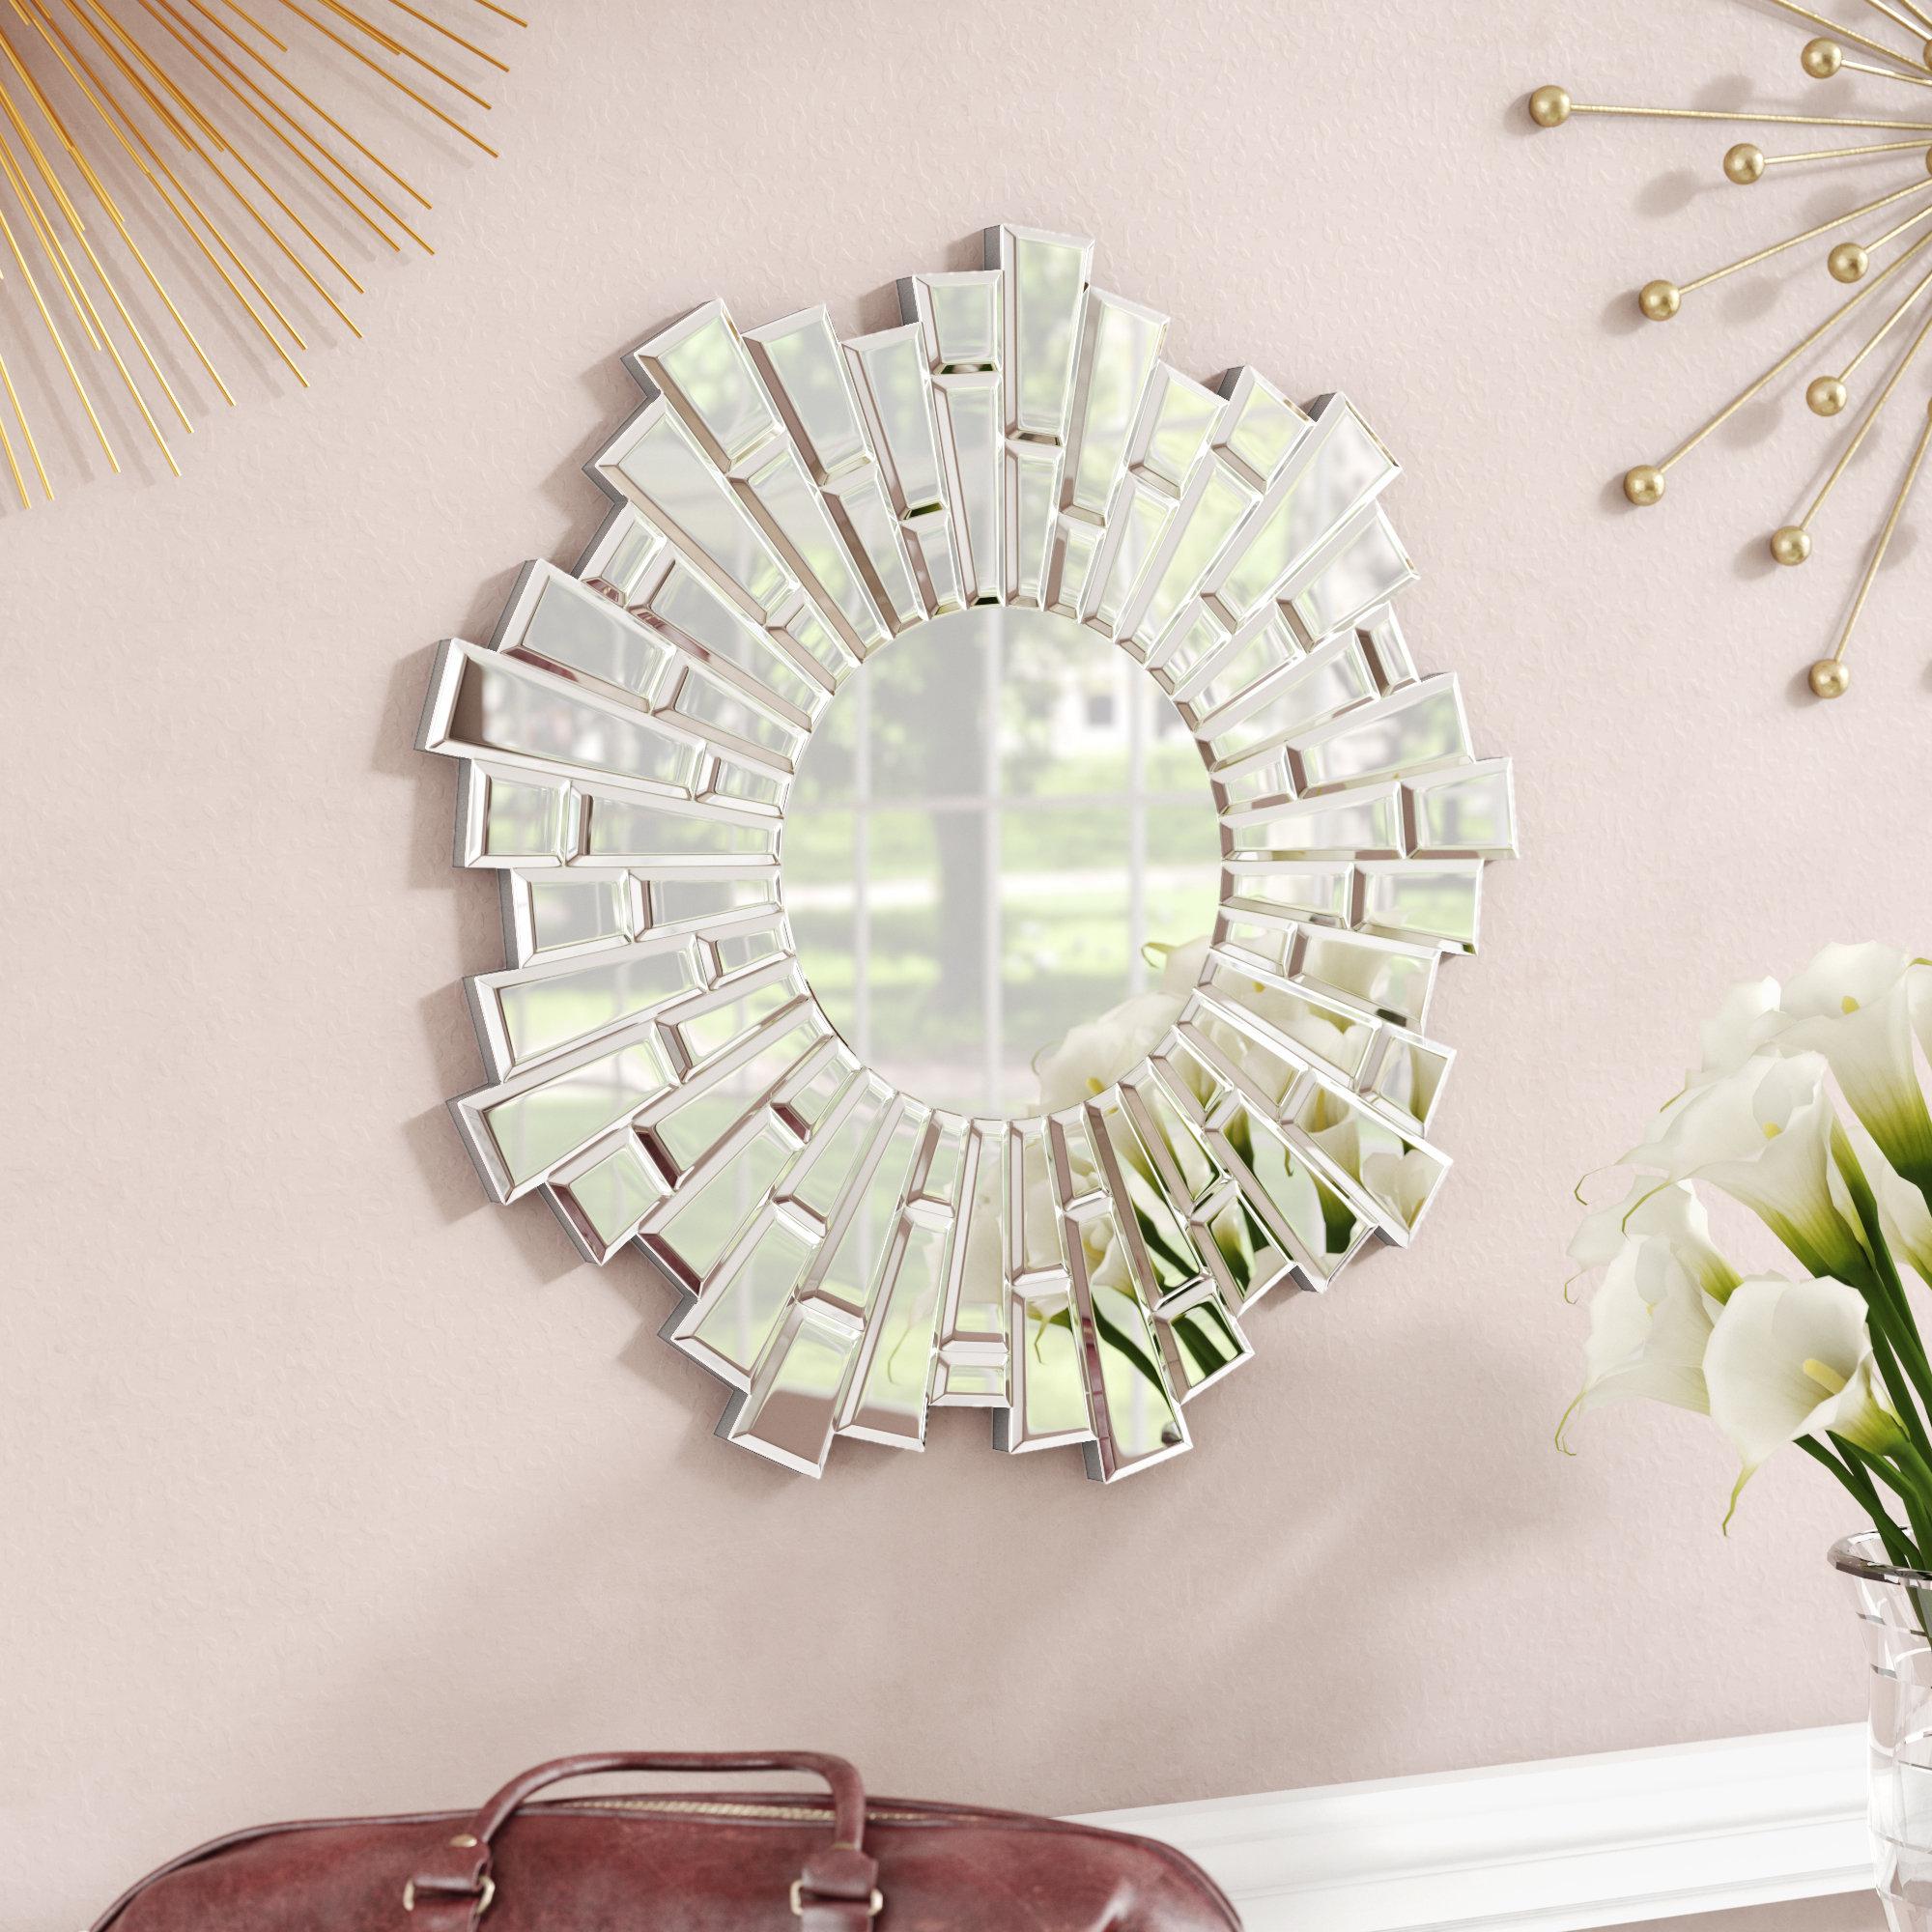 Everly Quinn Naoma Modern Sunburst Glass Accent Mirror For Estrela Modern Sunburst Metal Wall Mirrors (View 6 of 30)